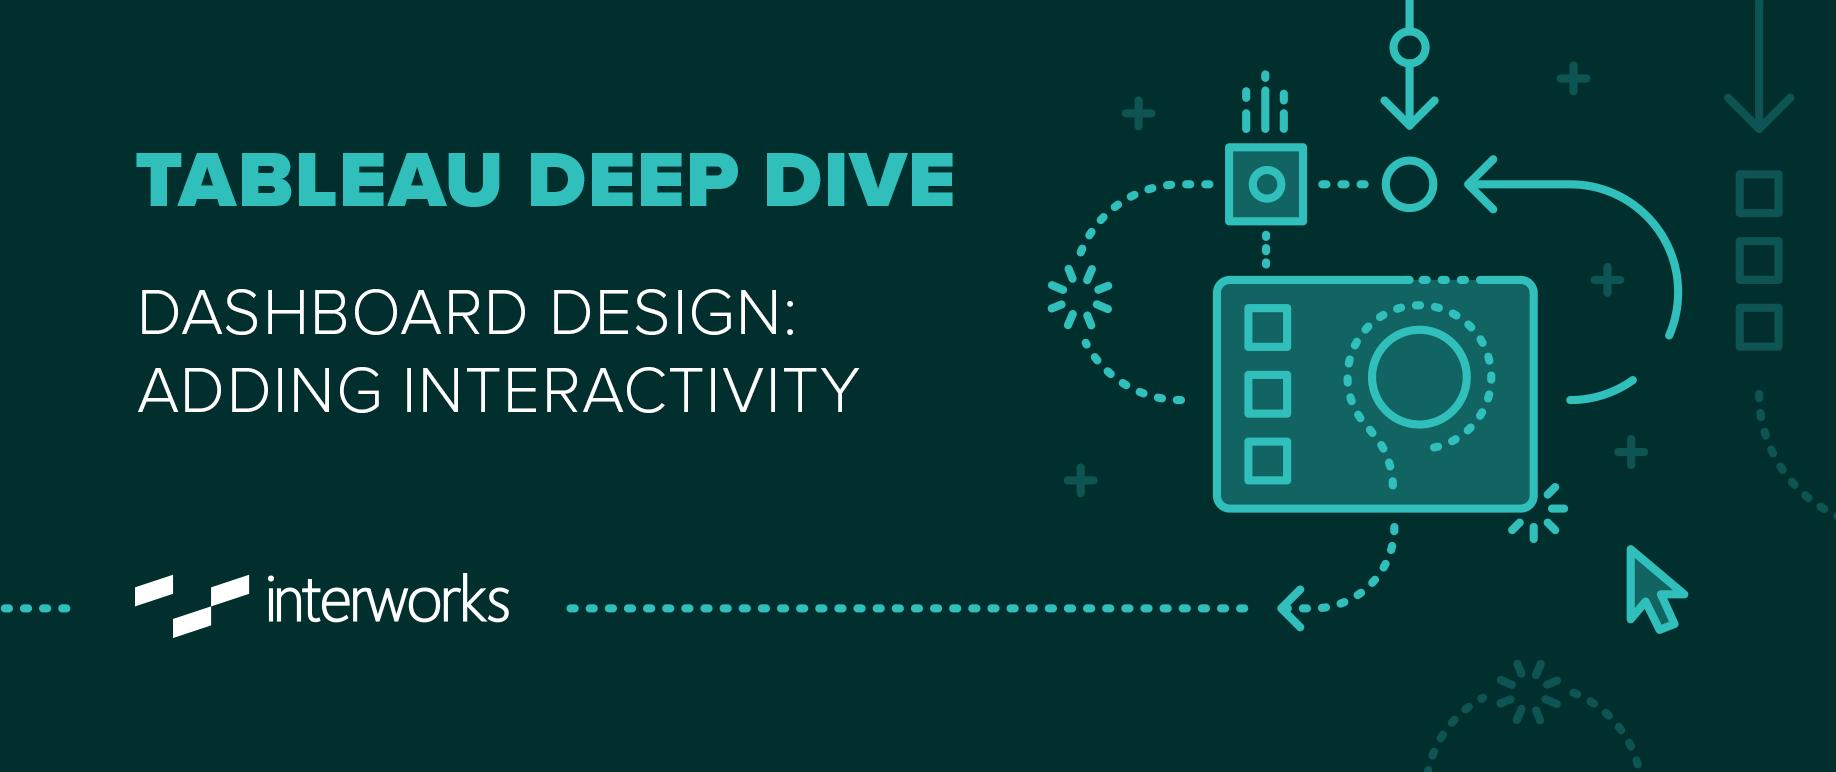 Tableau Deep Dive Dashboard Design